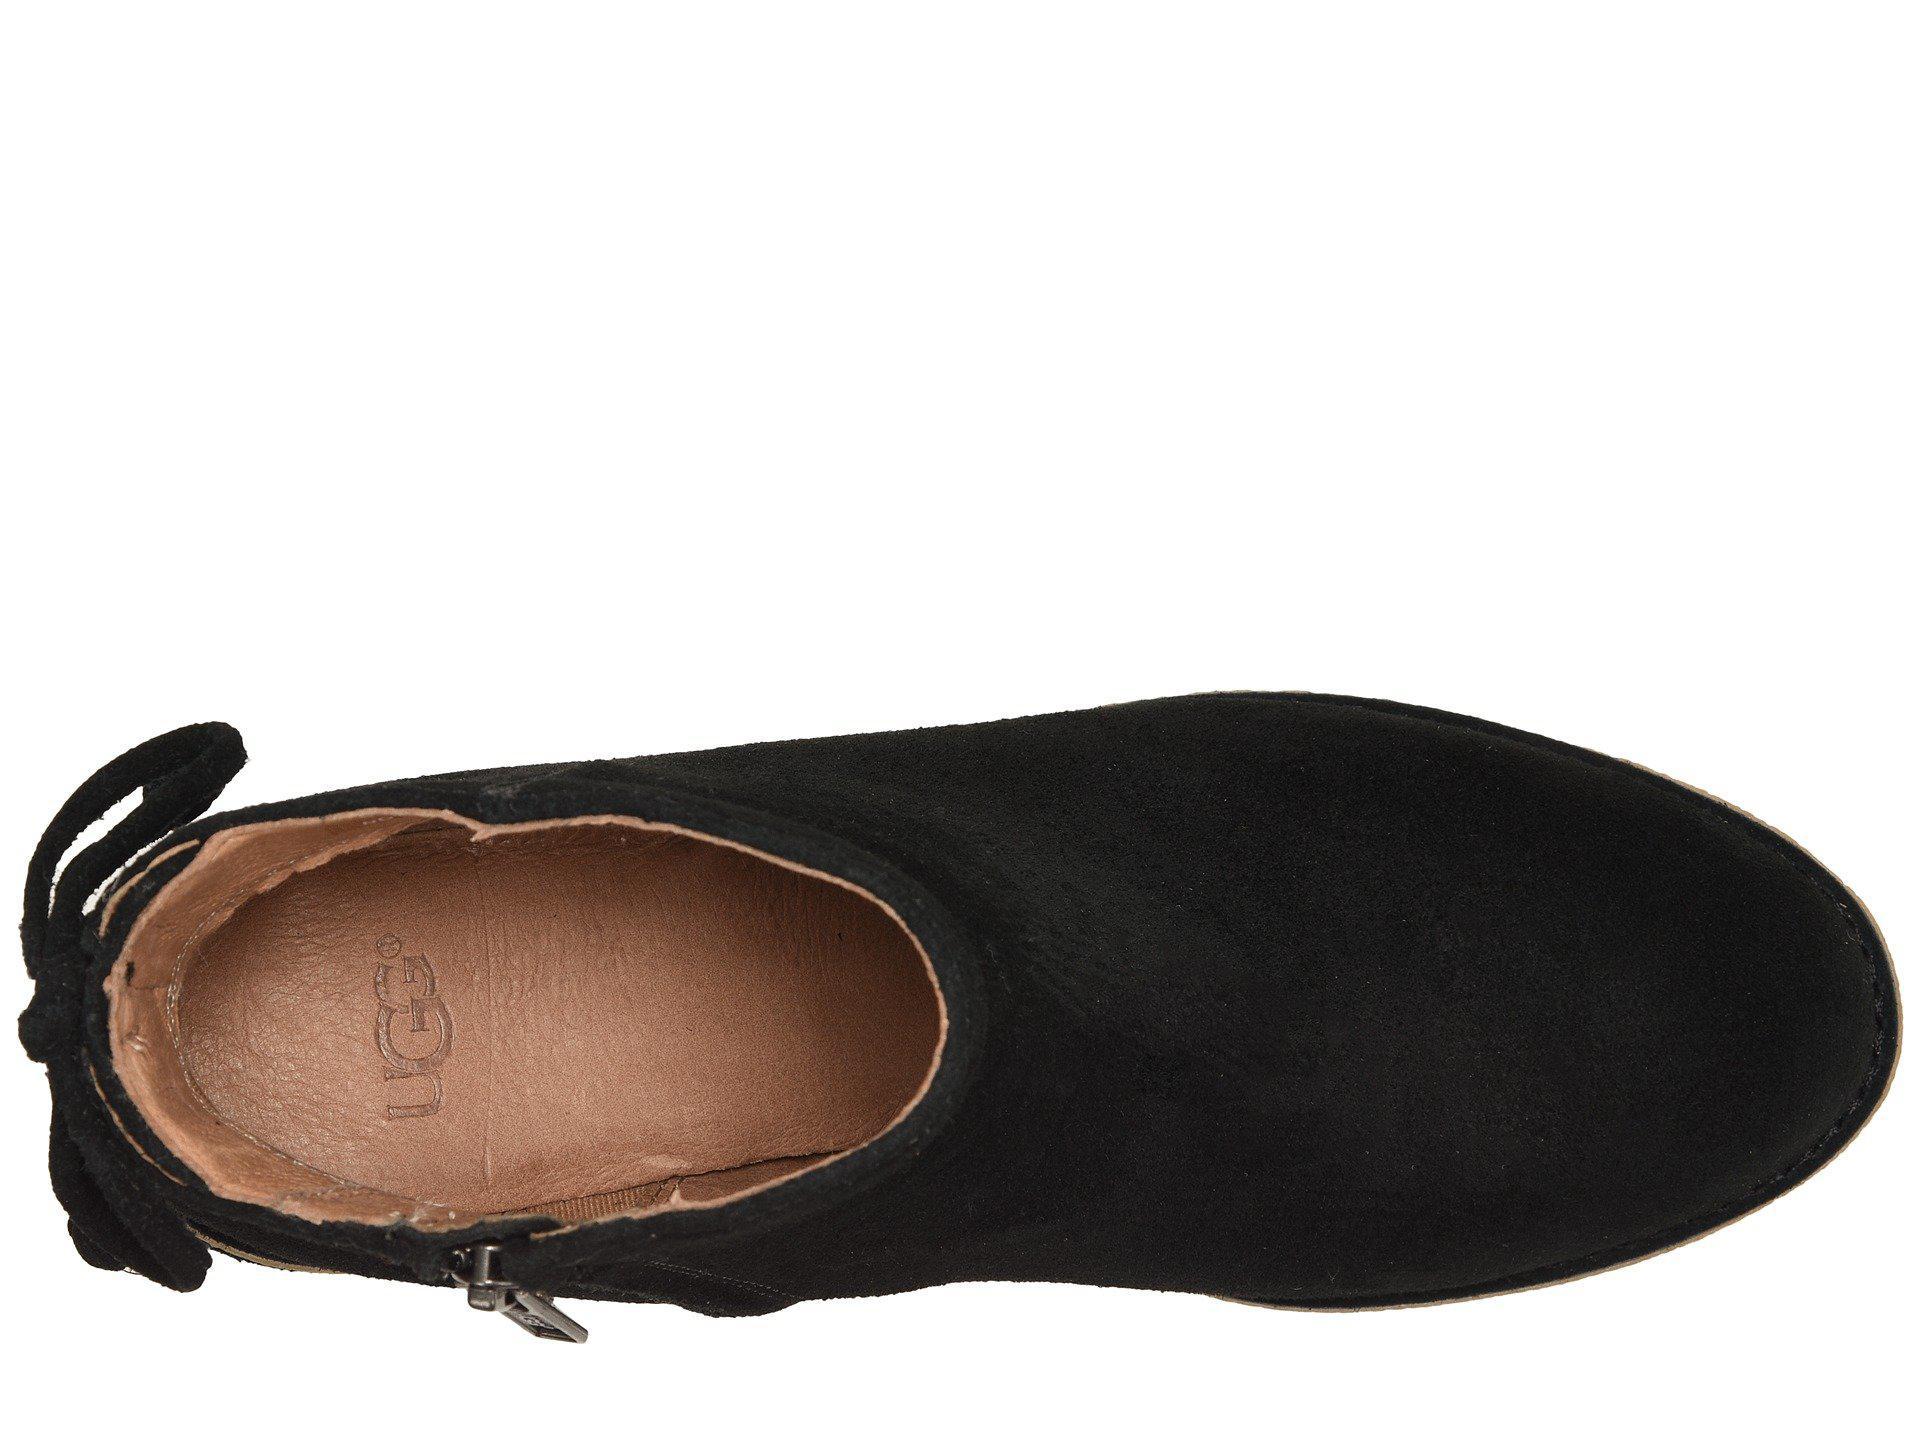 Lyst - UGG Corinne Boot (black) Women s Zip Boots in Black 9d4916af9